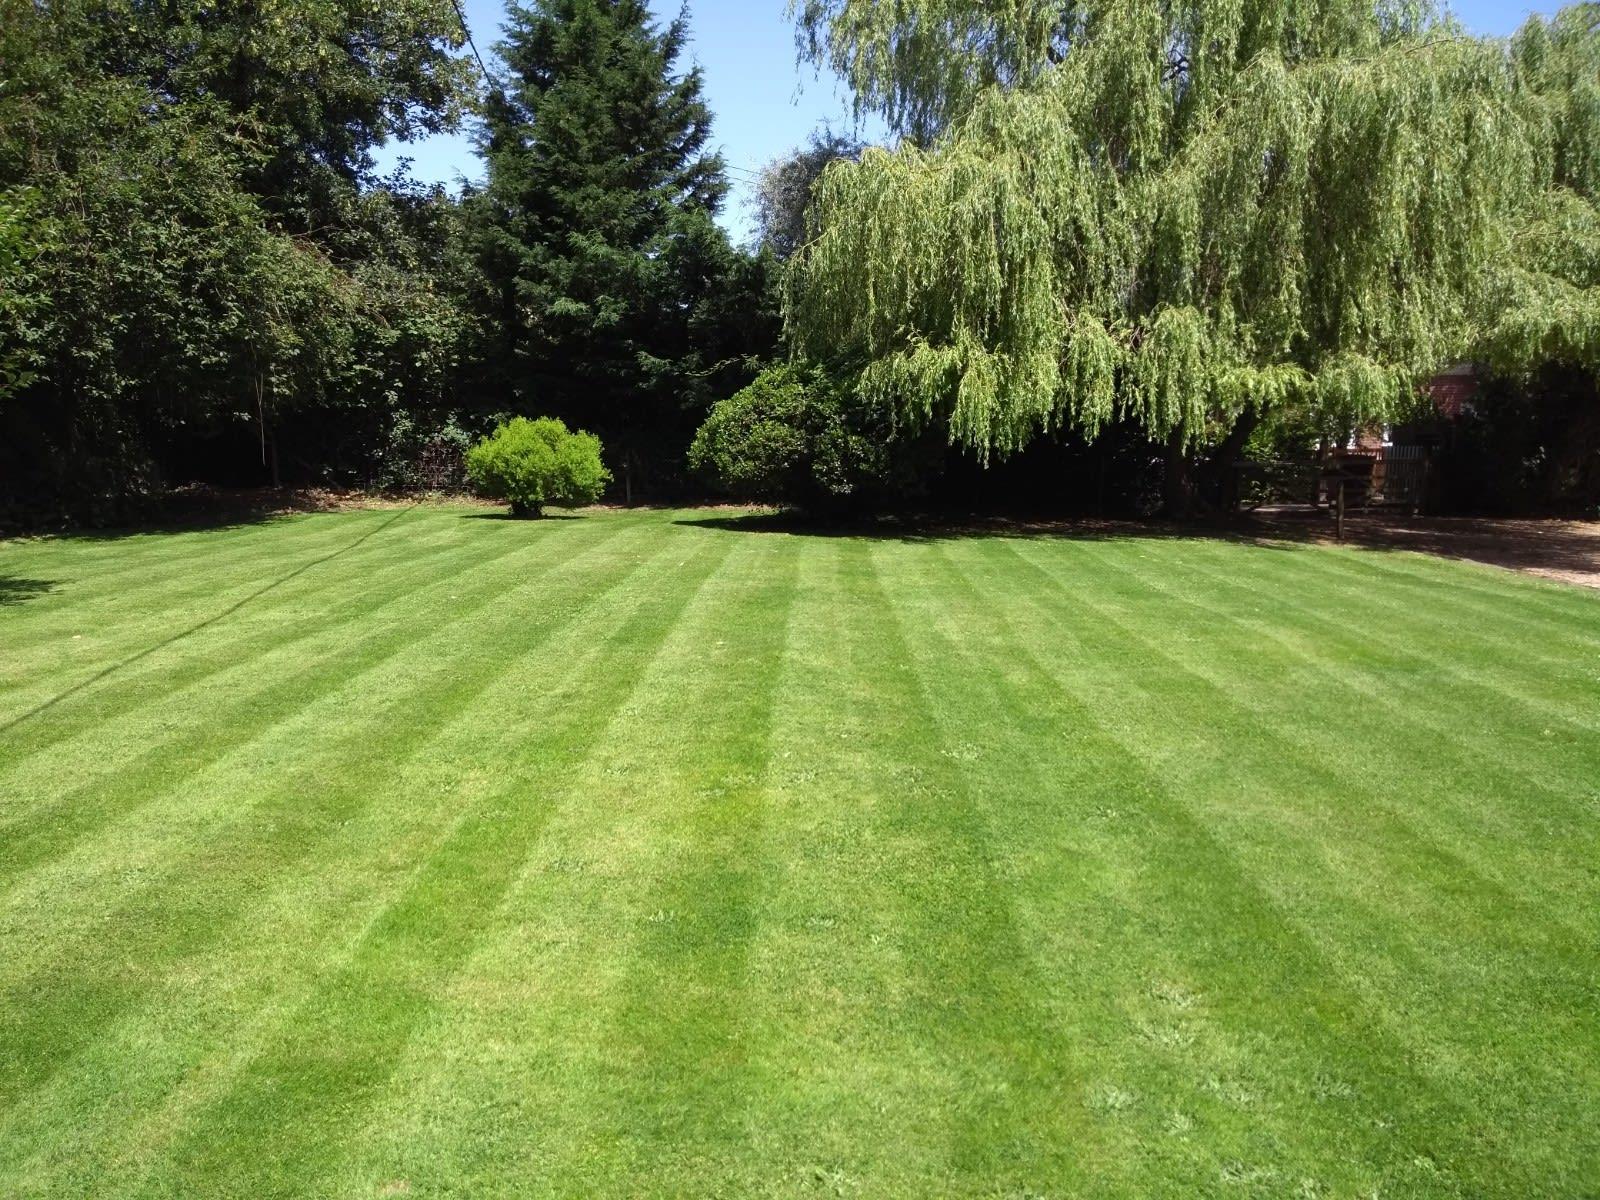 Tunbridge Wells Gardening business lawn mowing stripes